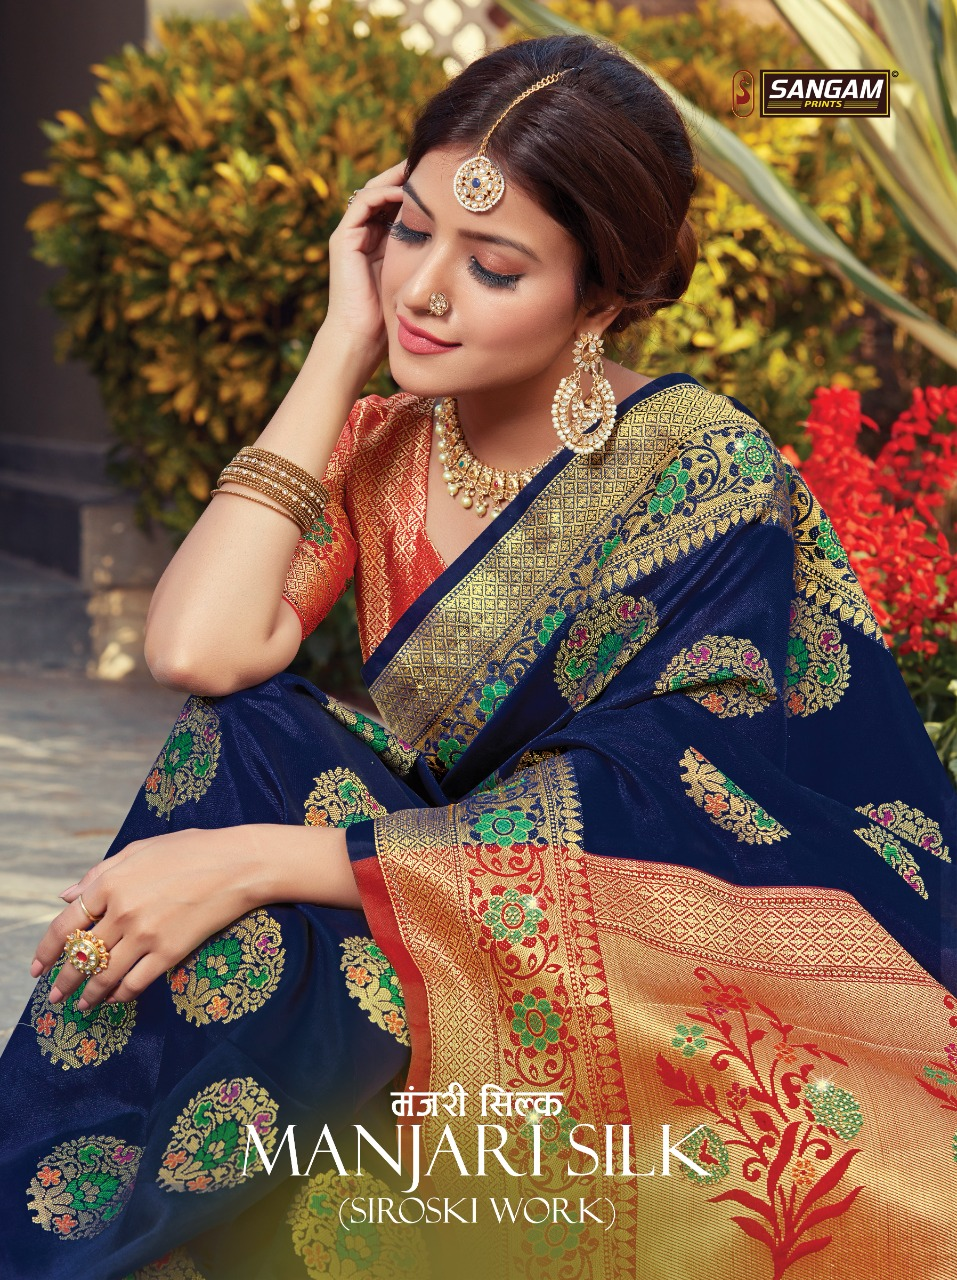 Sangam Prints Majari Silk Traditional Wear Indian Silk With Work Designer Wedding Wear Saree